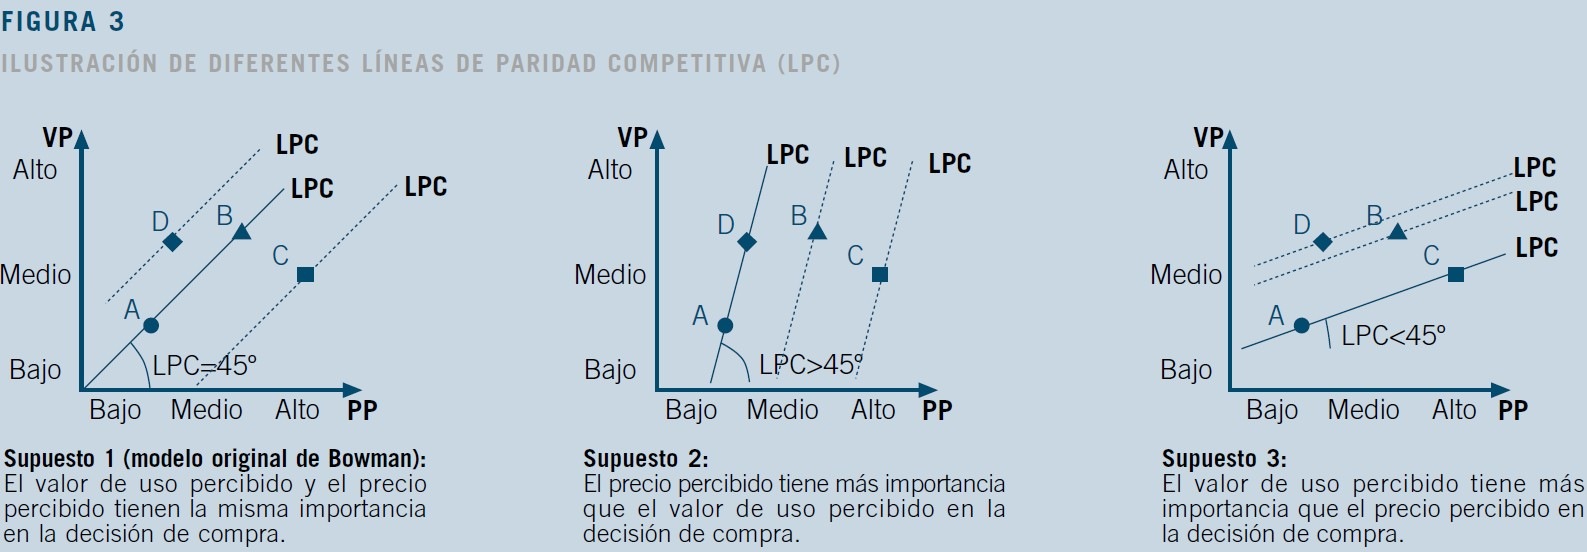 Línea Paridad Competitiva